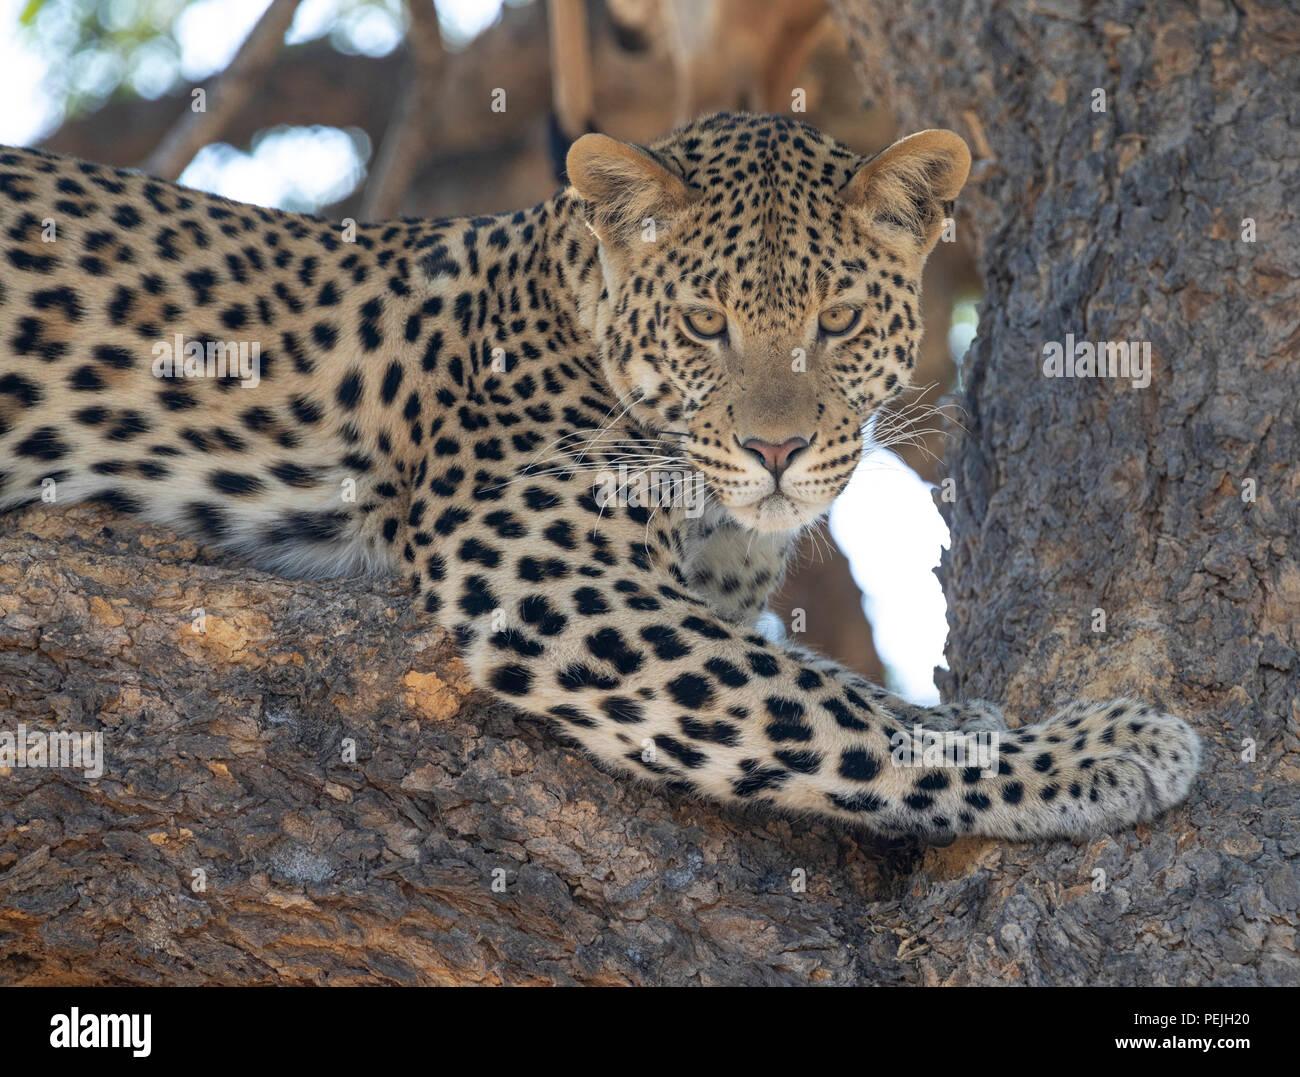 Leopard perched in tree with dead impala, Okavanga Delta, Botswana - Stock Image